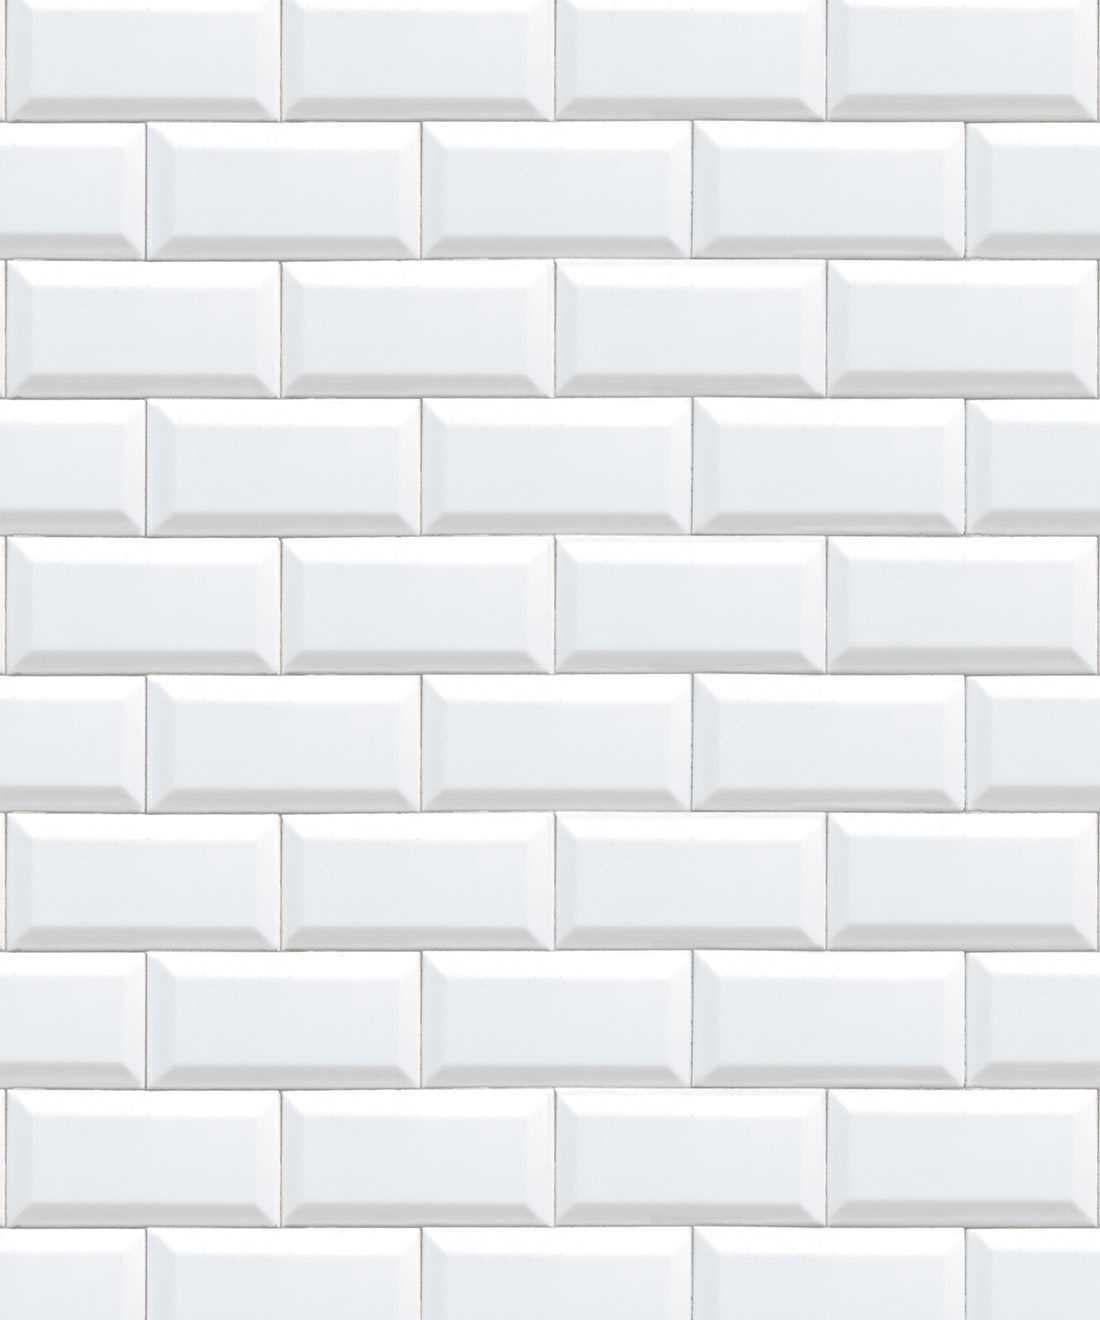 white subway tiles wallpaper minimal wallpaper milton king